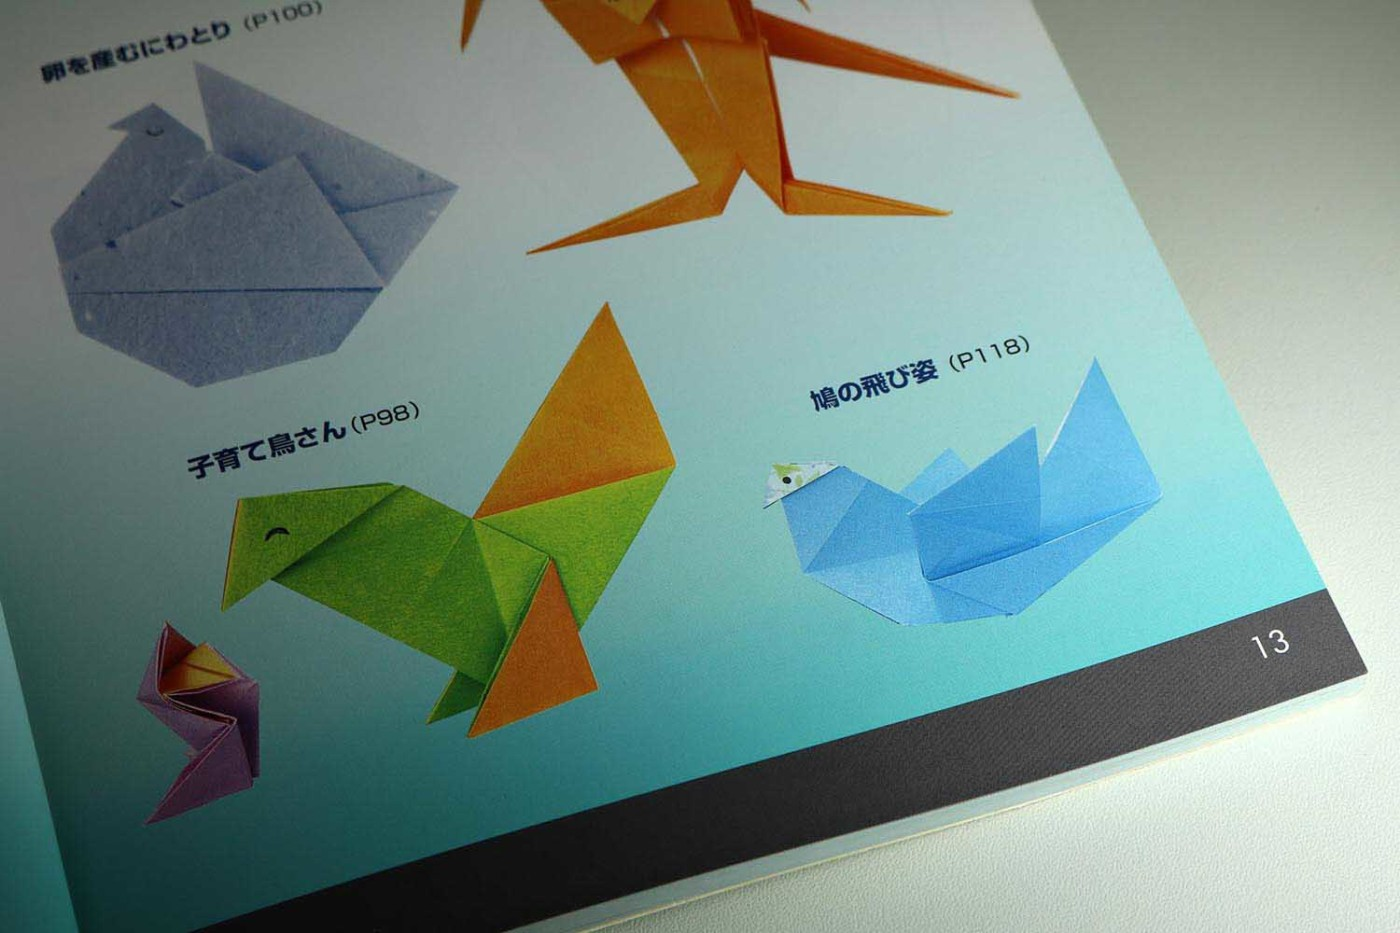 Contact us at Origami-Instructions.com | 933x1400